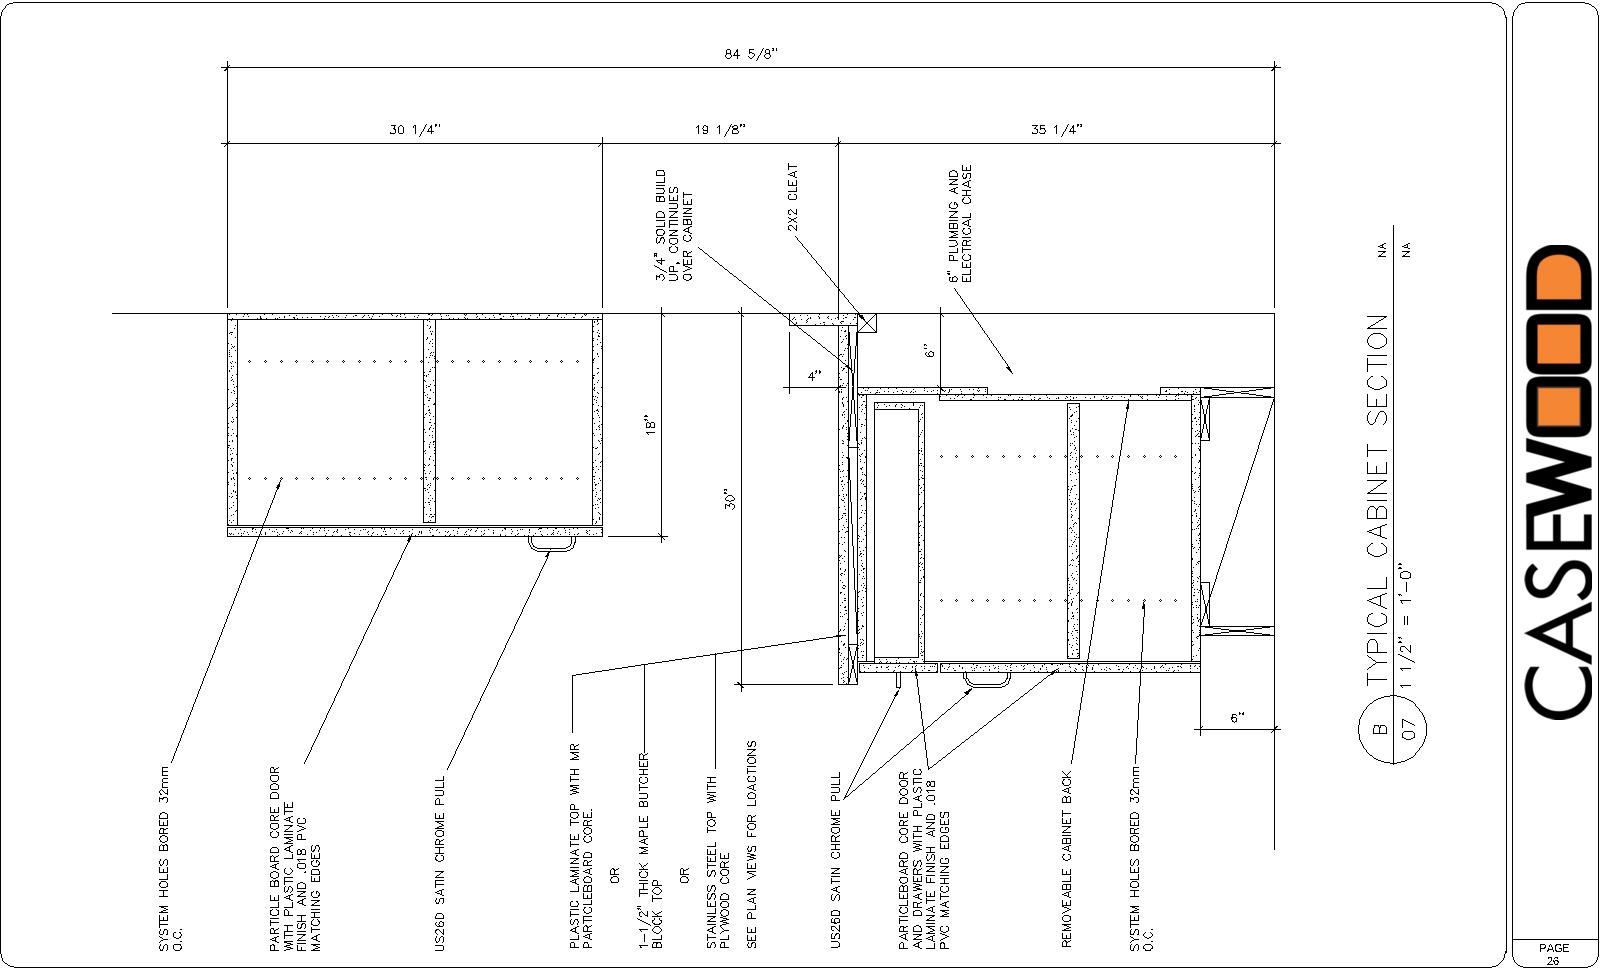 Sample Cad Drawings Casewood Cabinet Shop Drawings